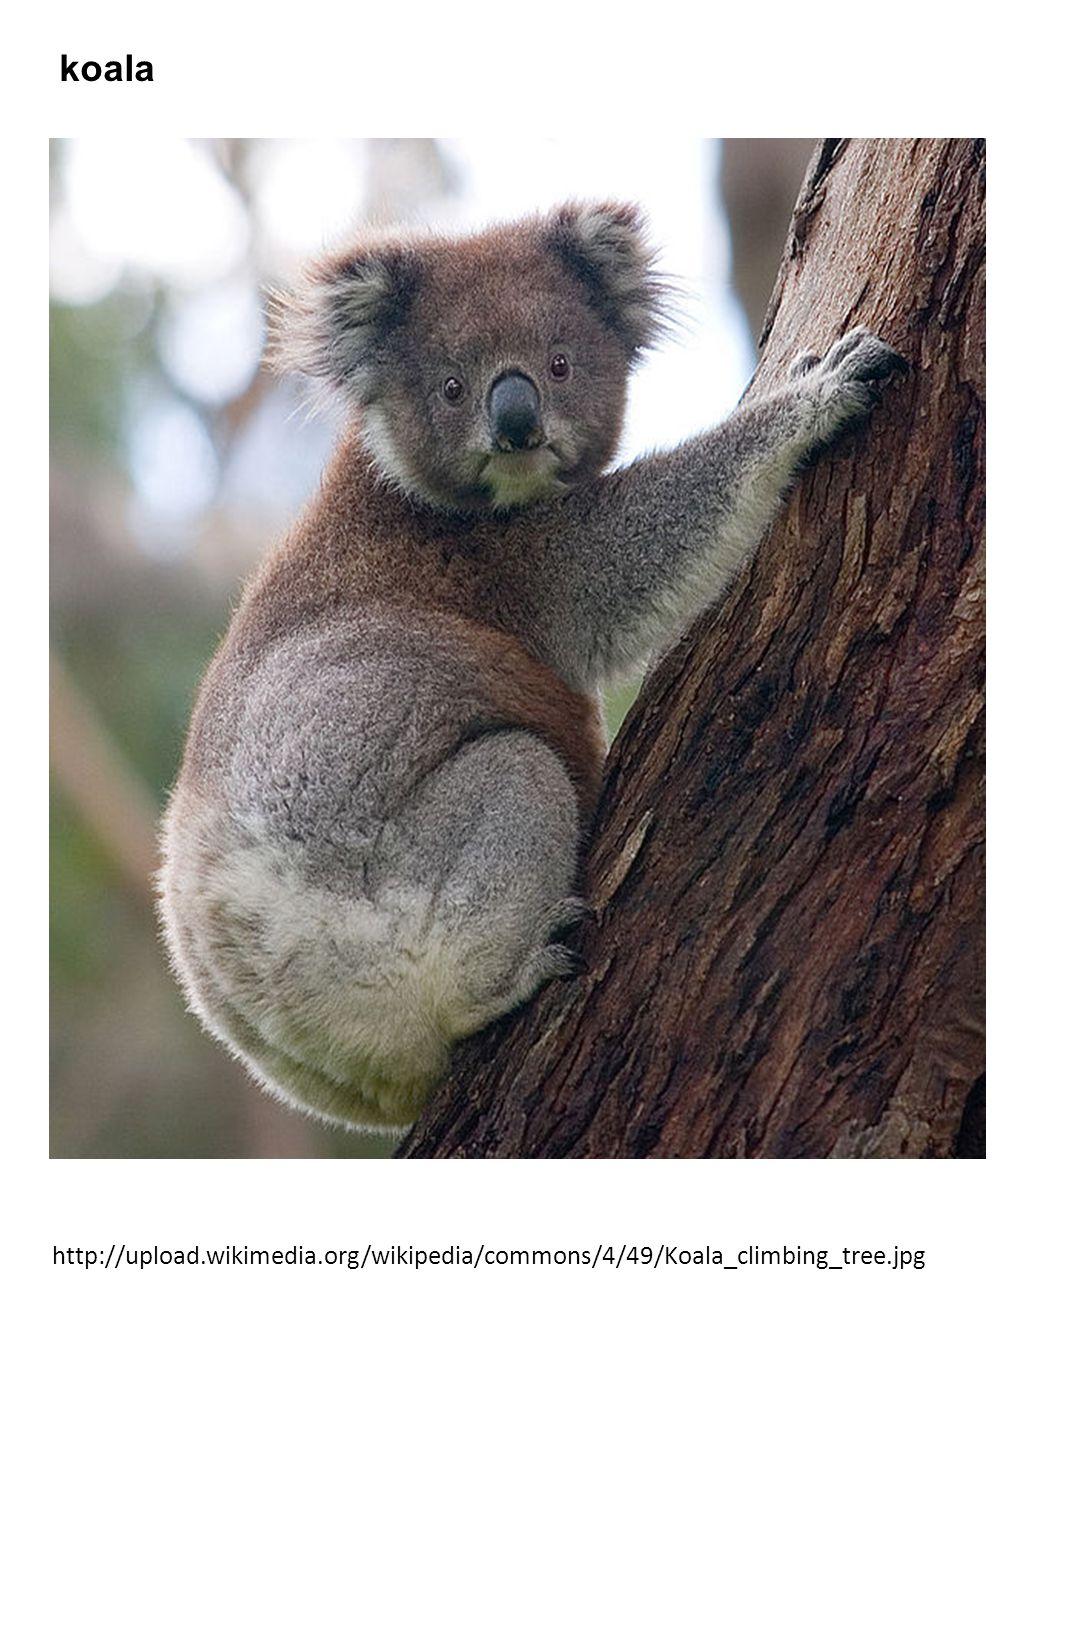 koala http://upload.wikimedia.org/wikipedia/commons/4/49/Koala_climbing_tree.jpg